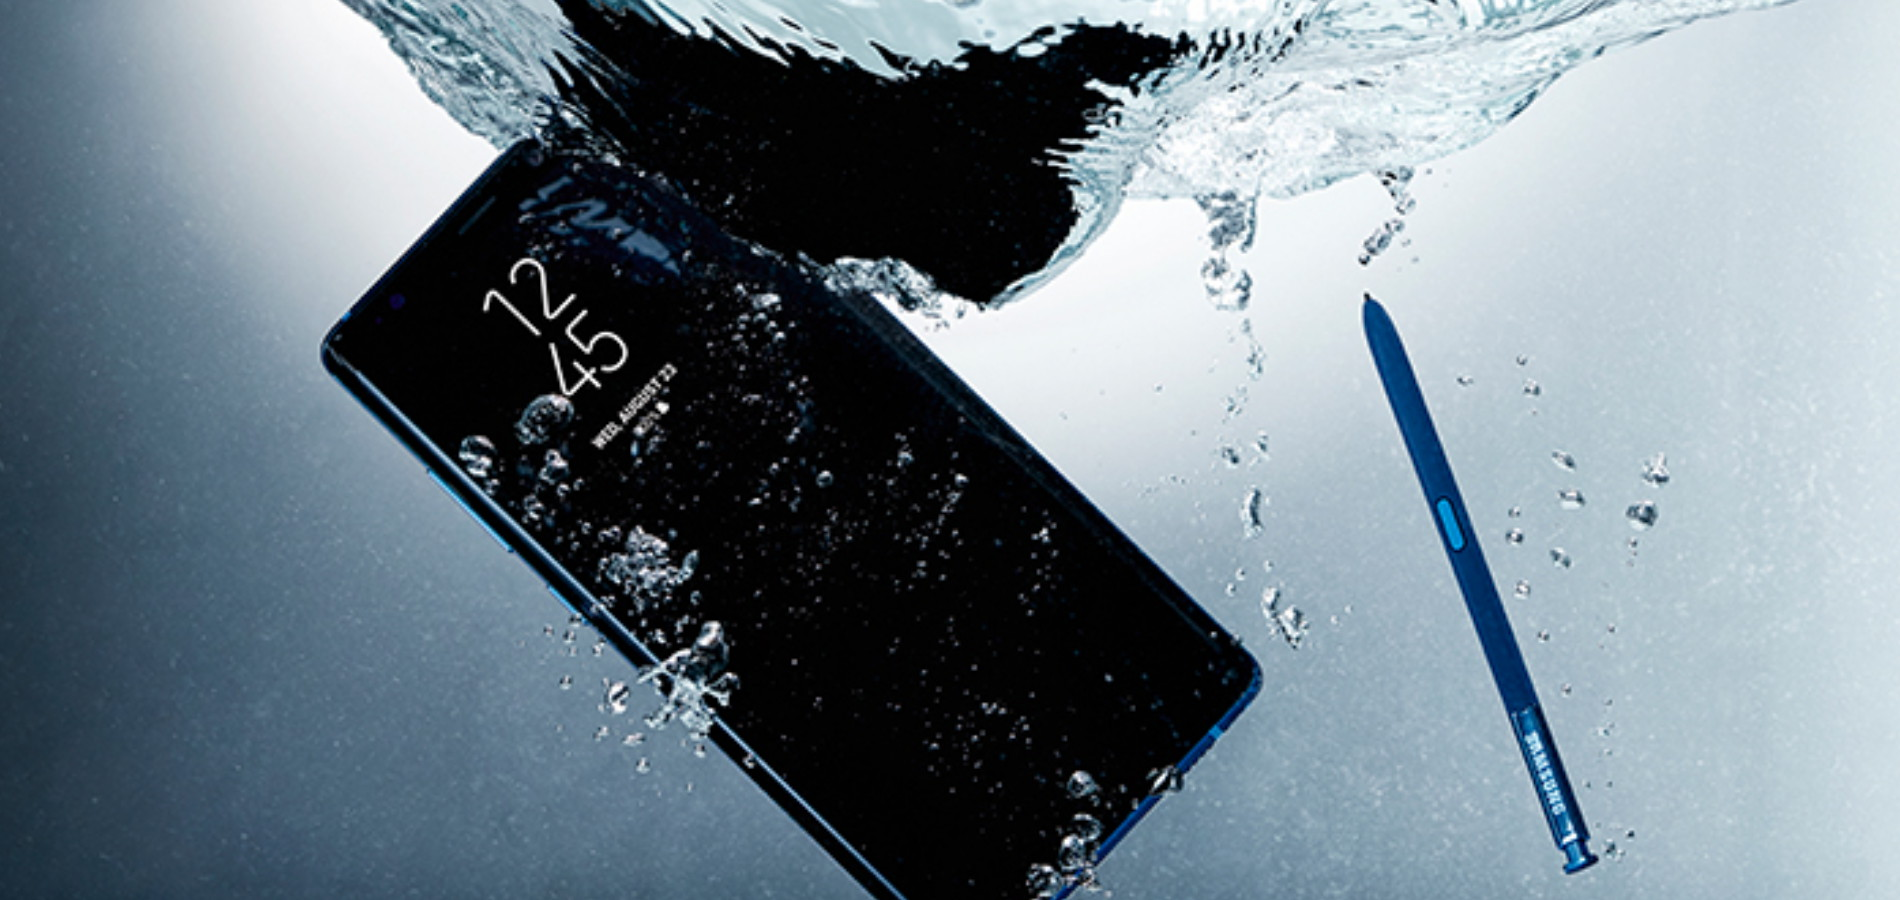 Galaxy Note8 wasserfest